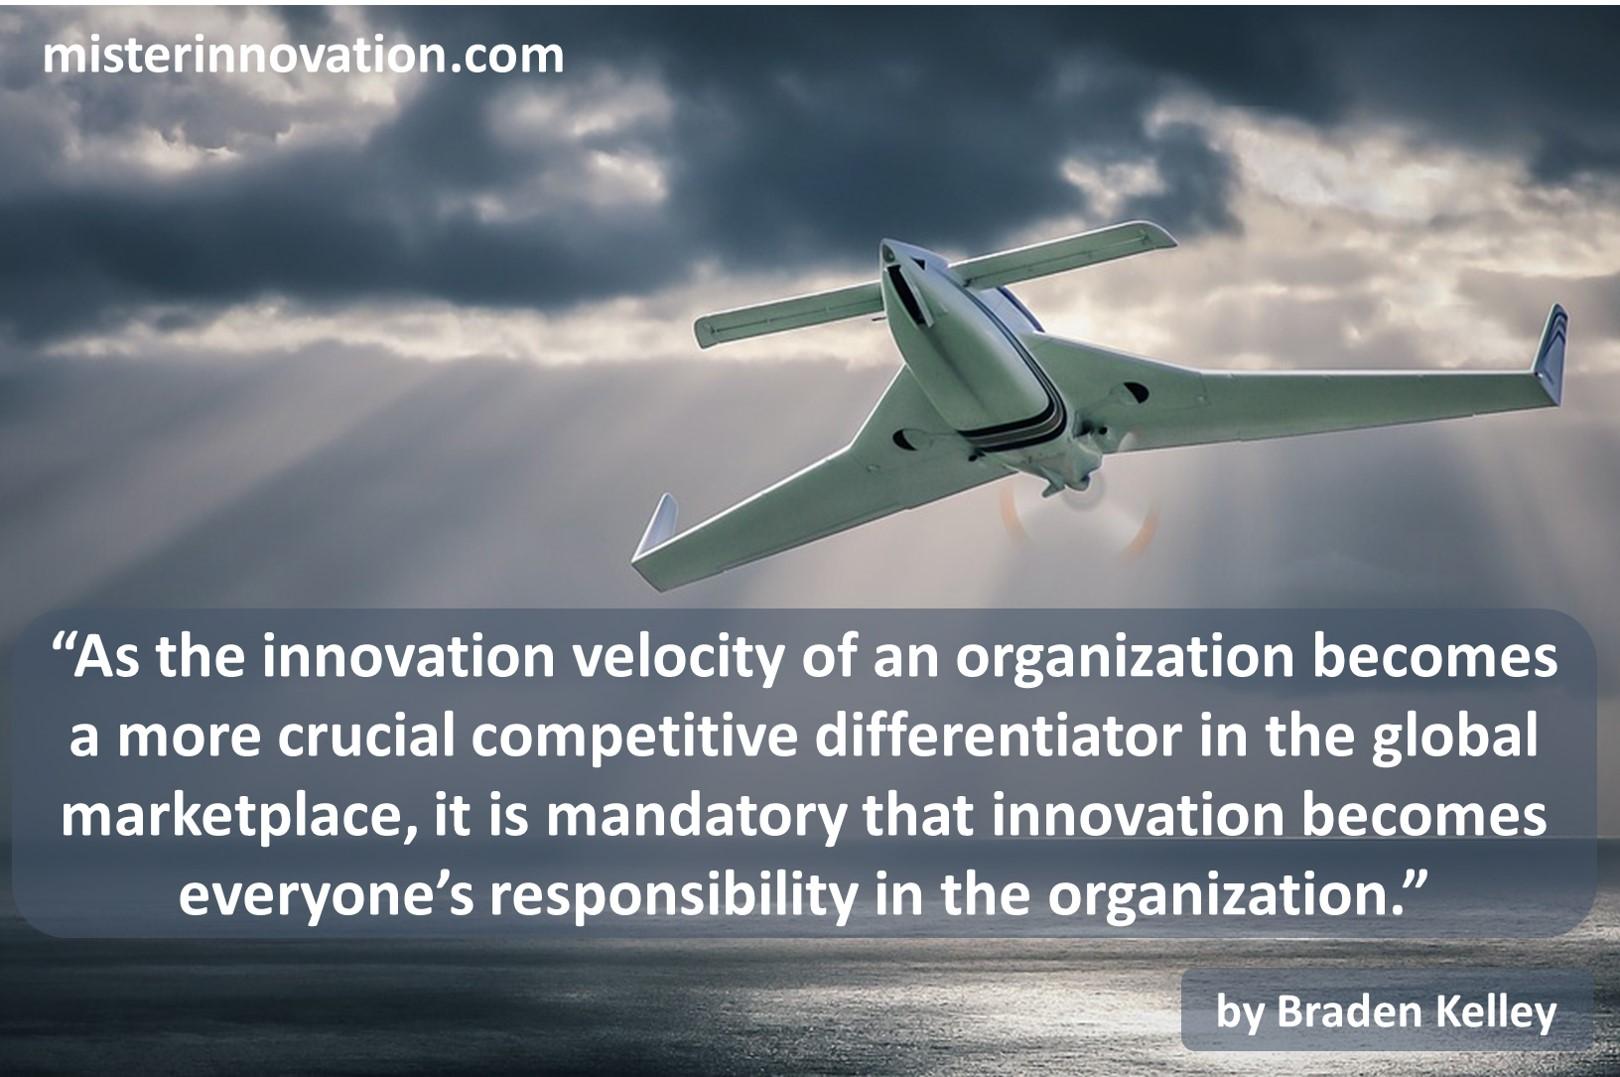 Innovation Velocity